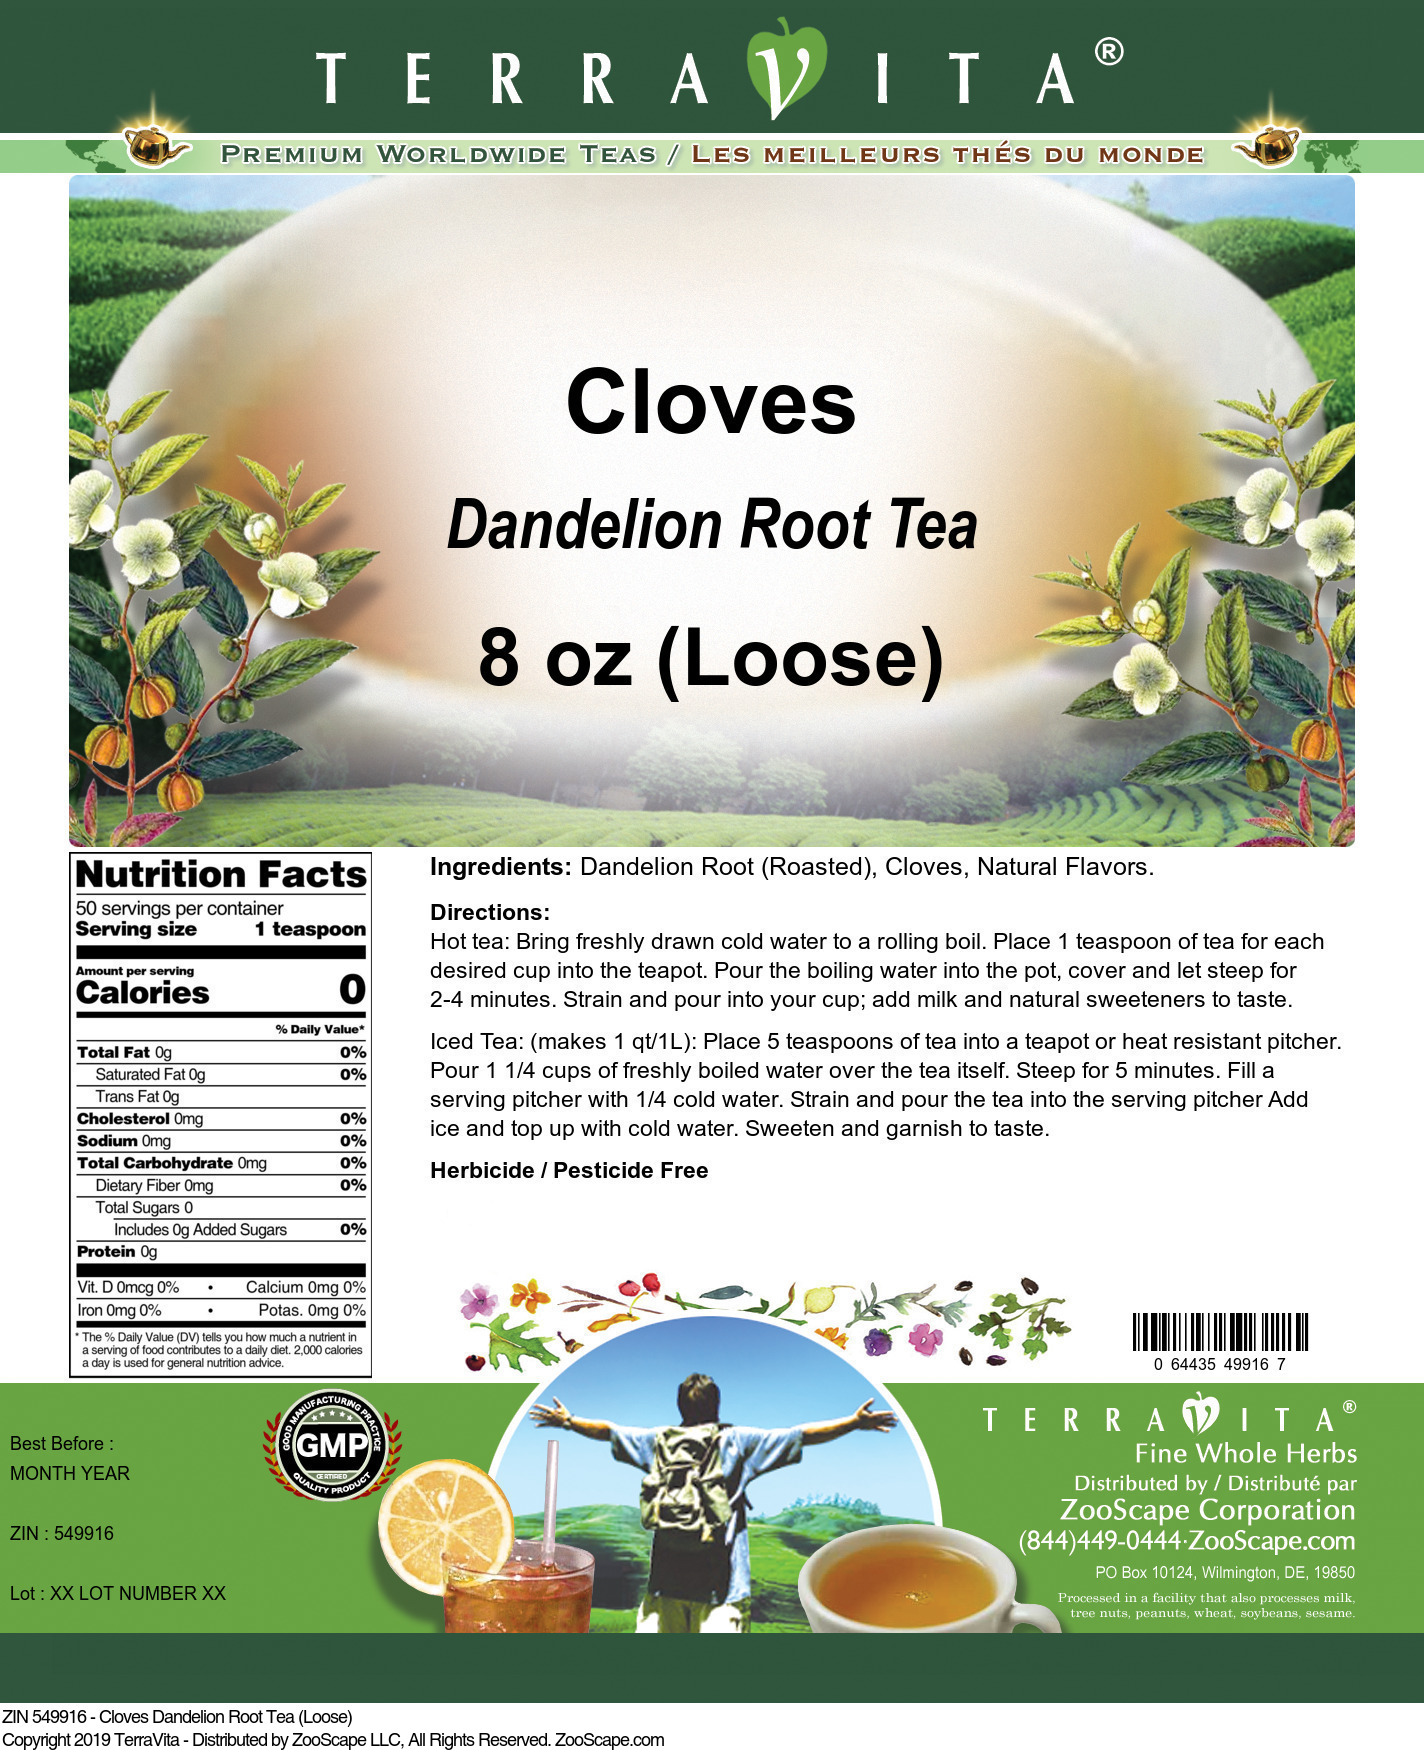 Cloves Dandelion Root Tea (Loose)